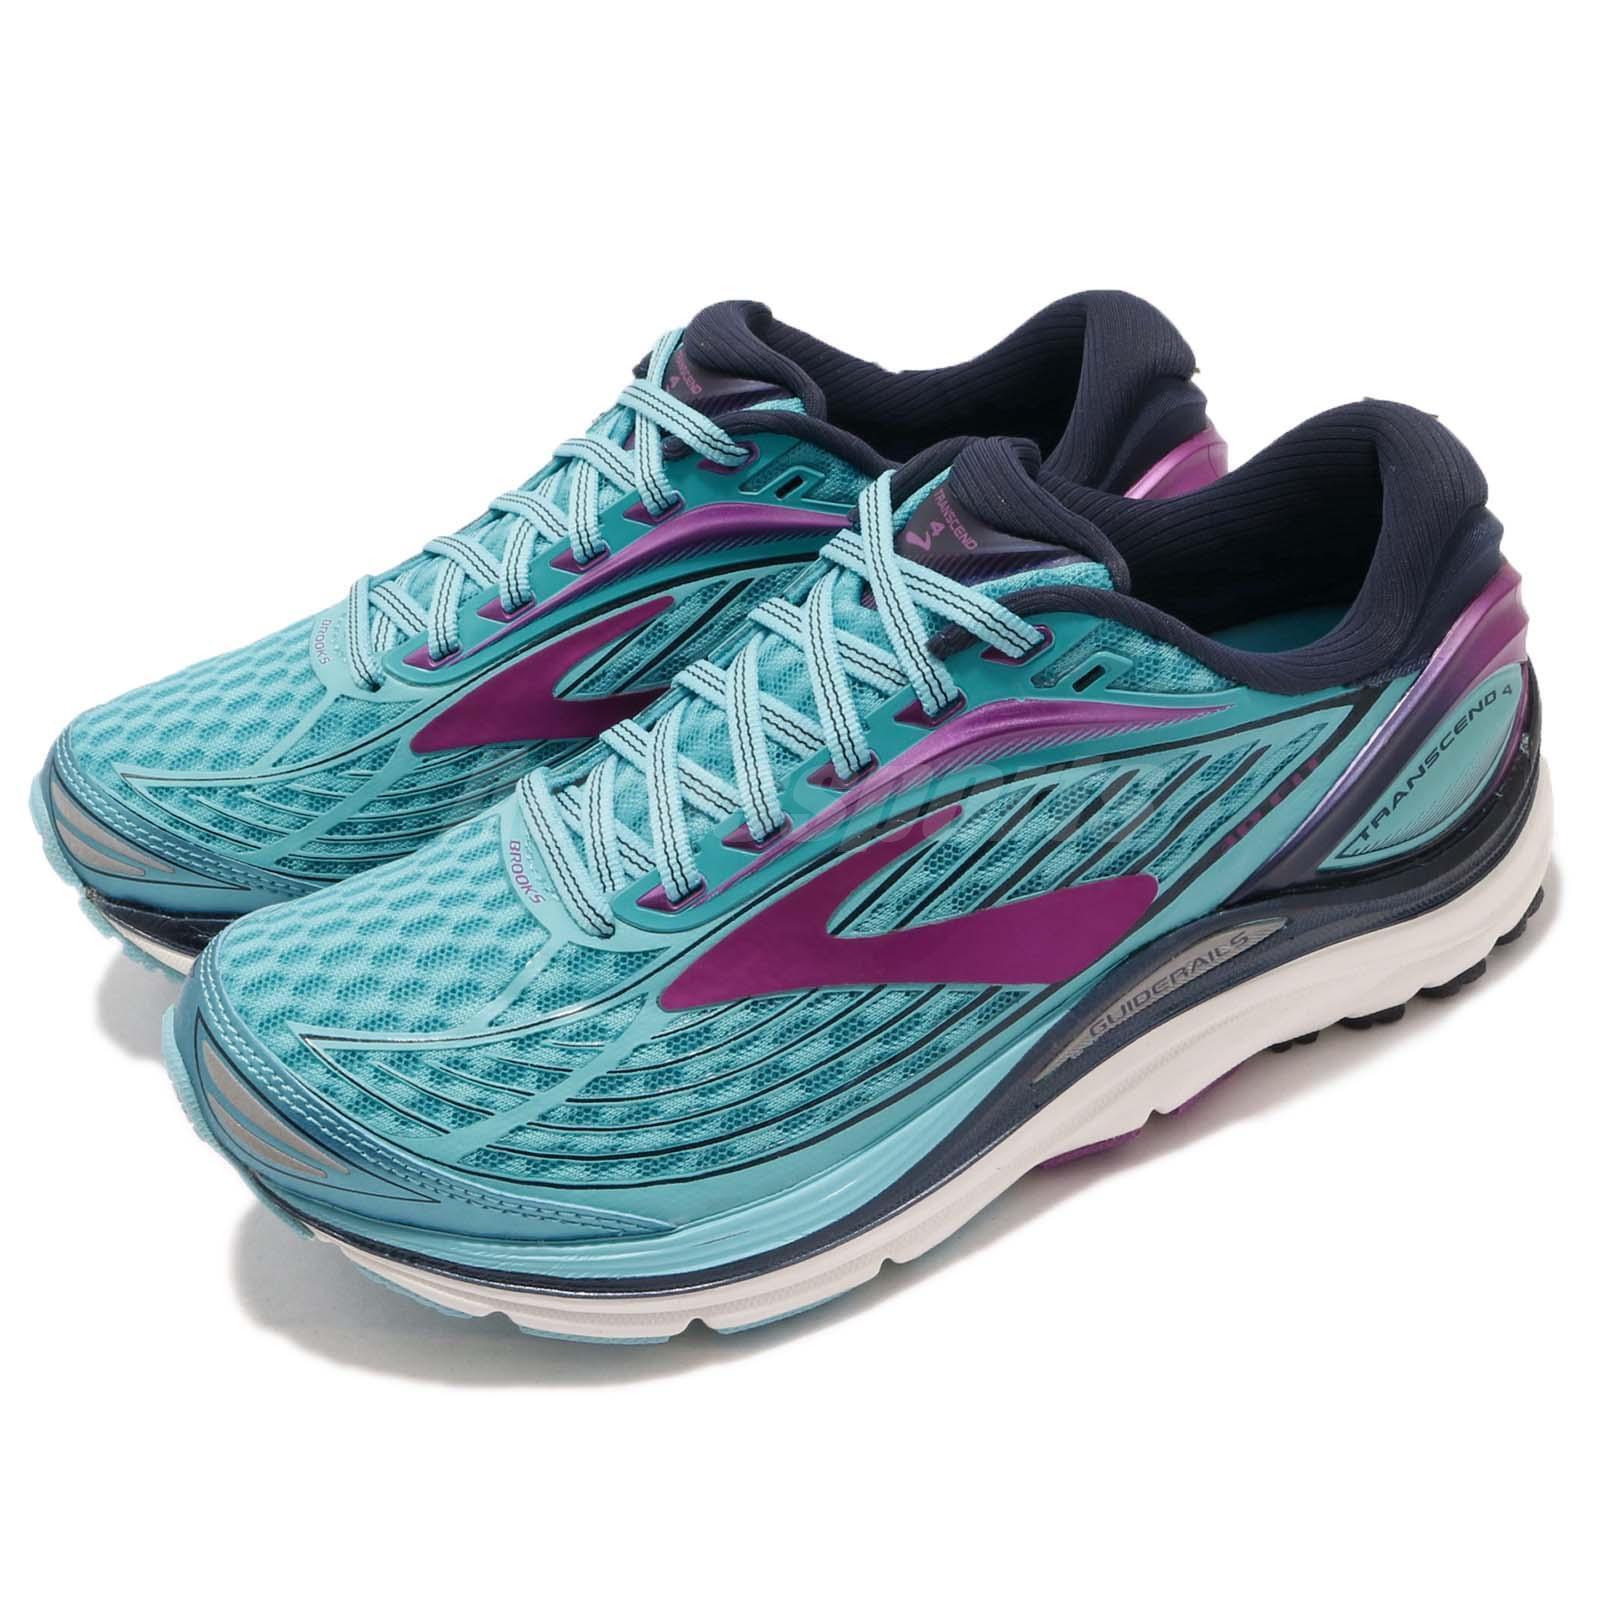 Brooks Transcend 4 bluee Peacoat Purple Women Running shoes Sneakers 120239 1B